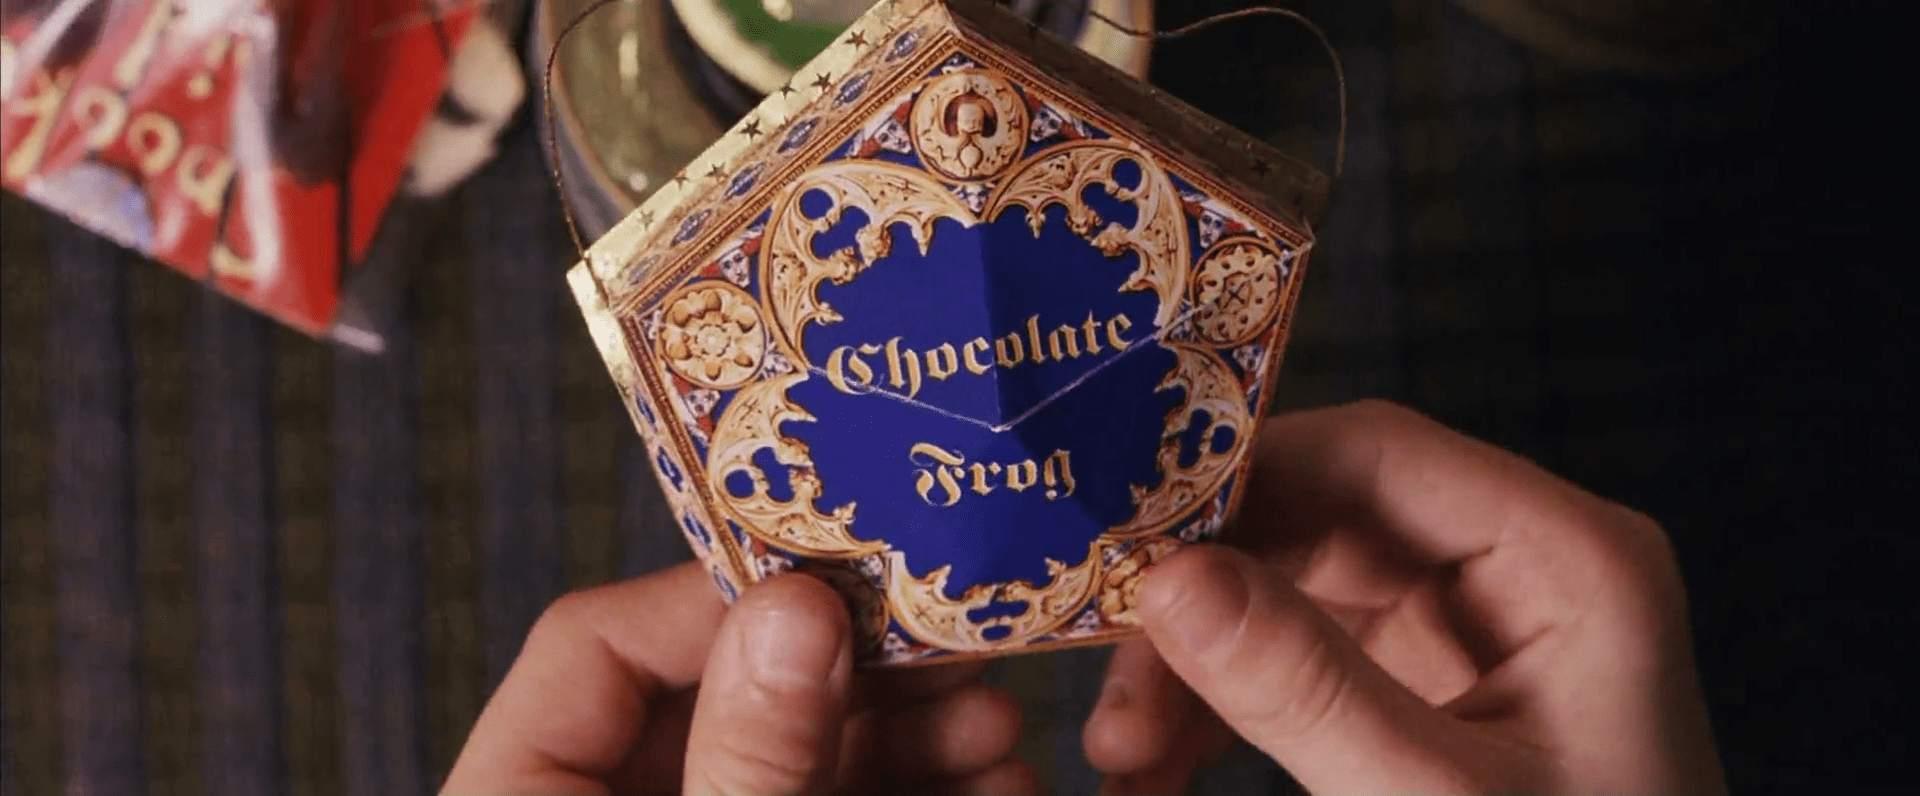 Wizarding World of Harry Potter merchandise - complete ...